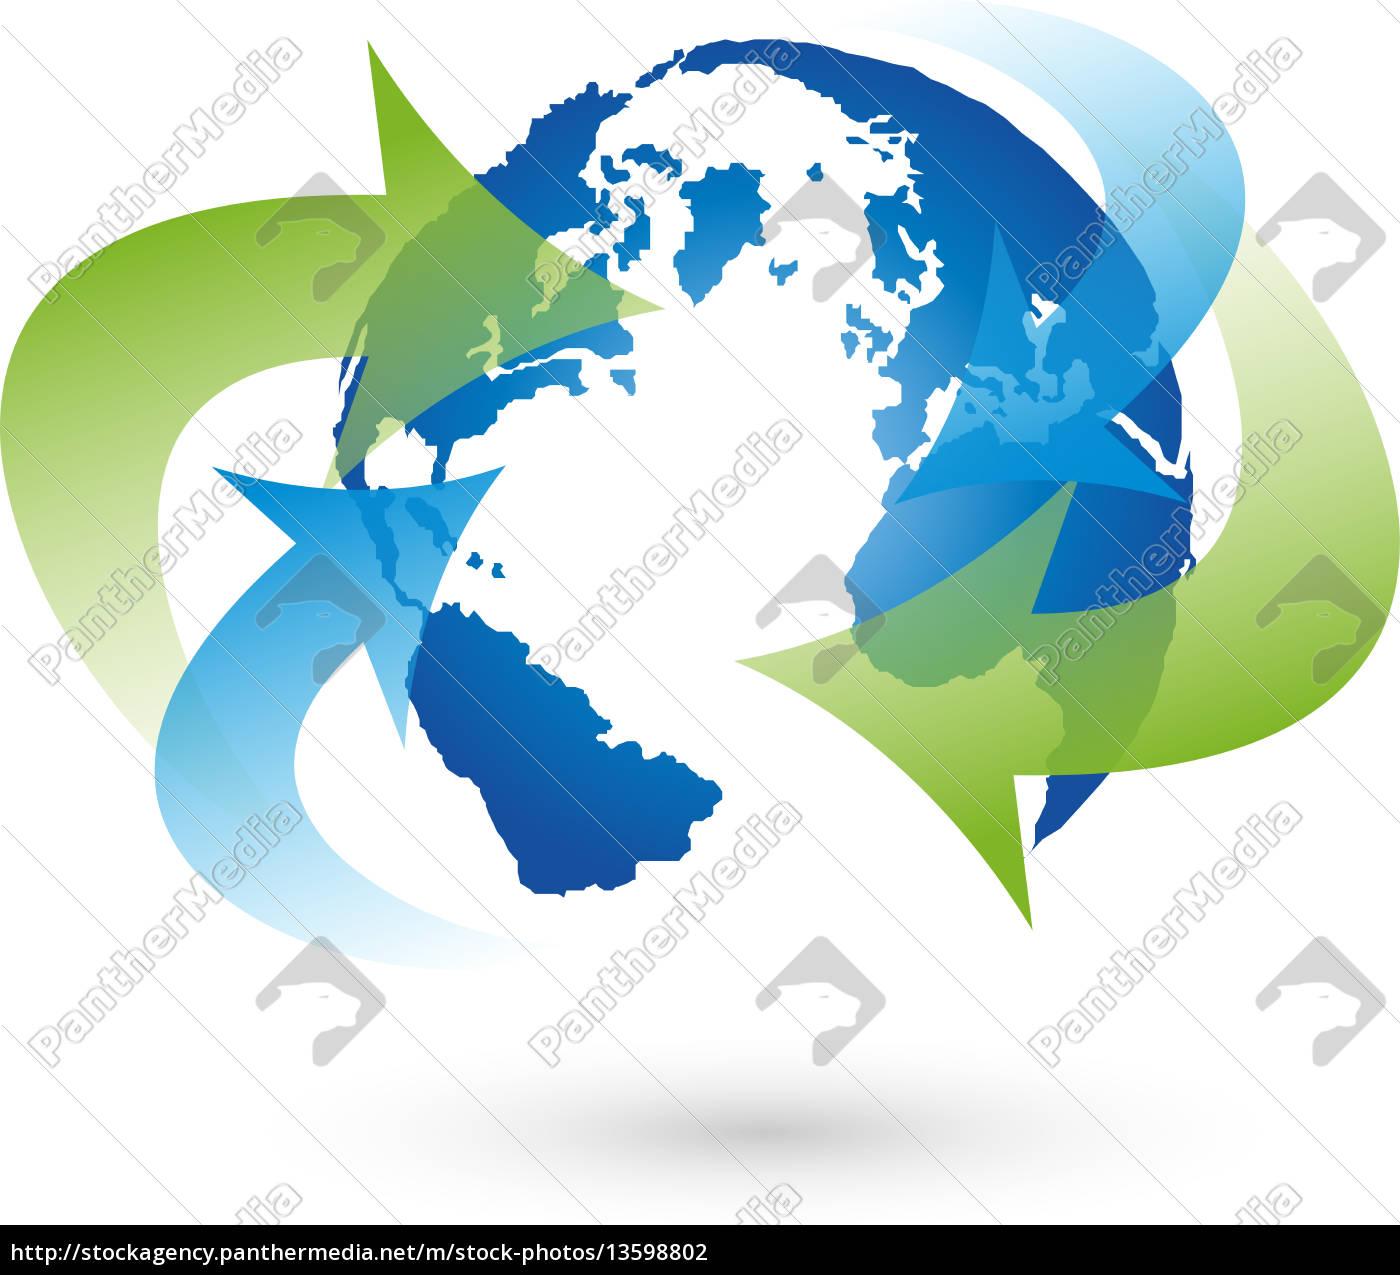 Globus Weltkugel Karte.Stockfoto 13598802 Logo Erde Globus Weltkugel